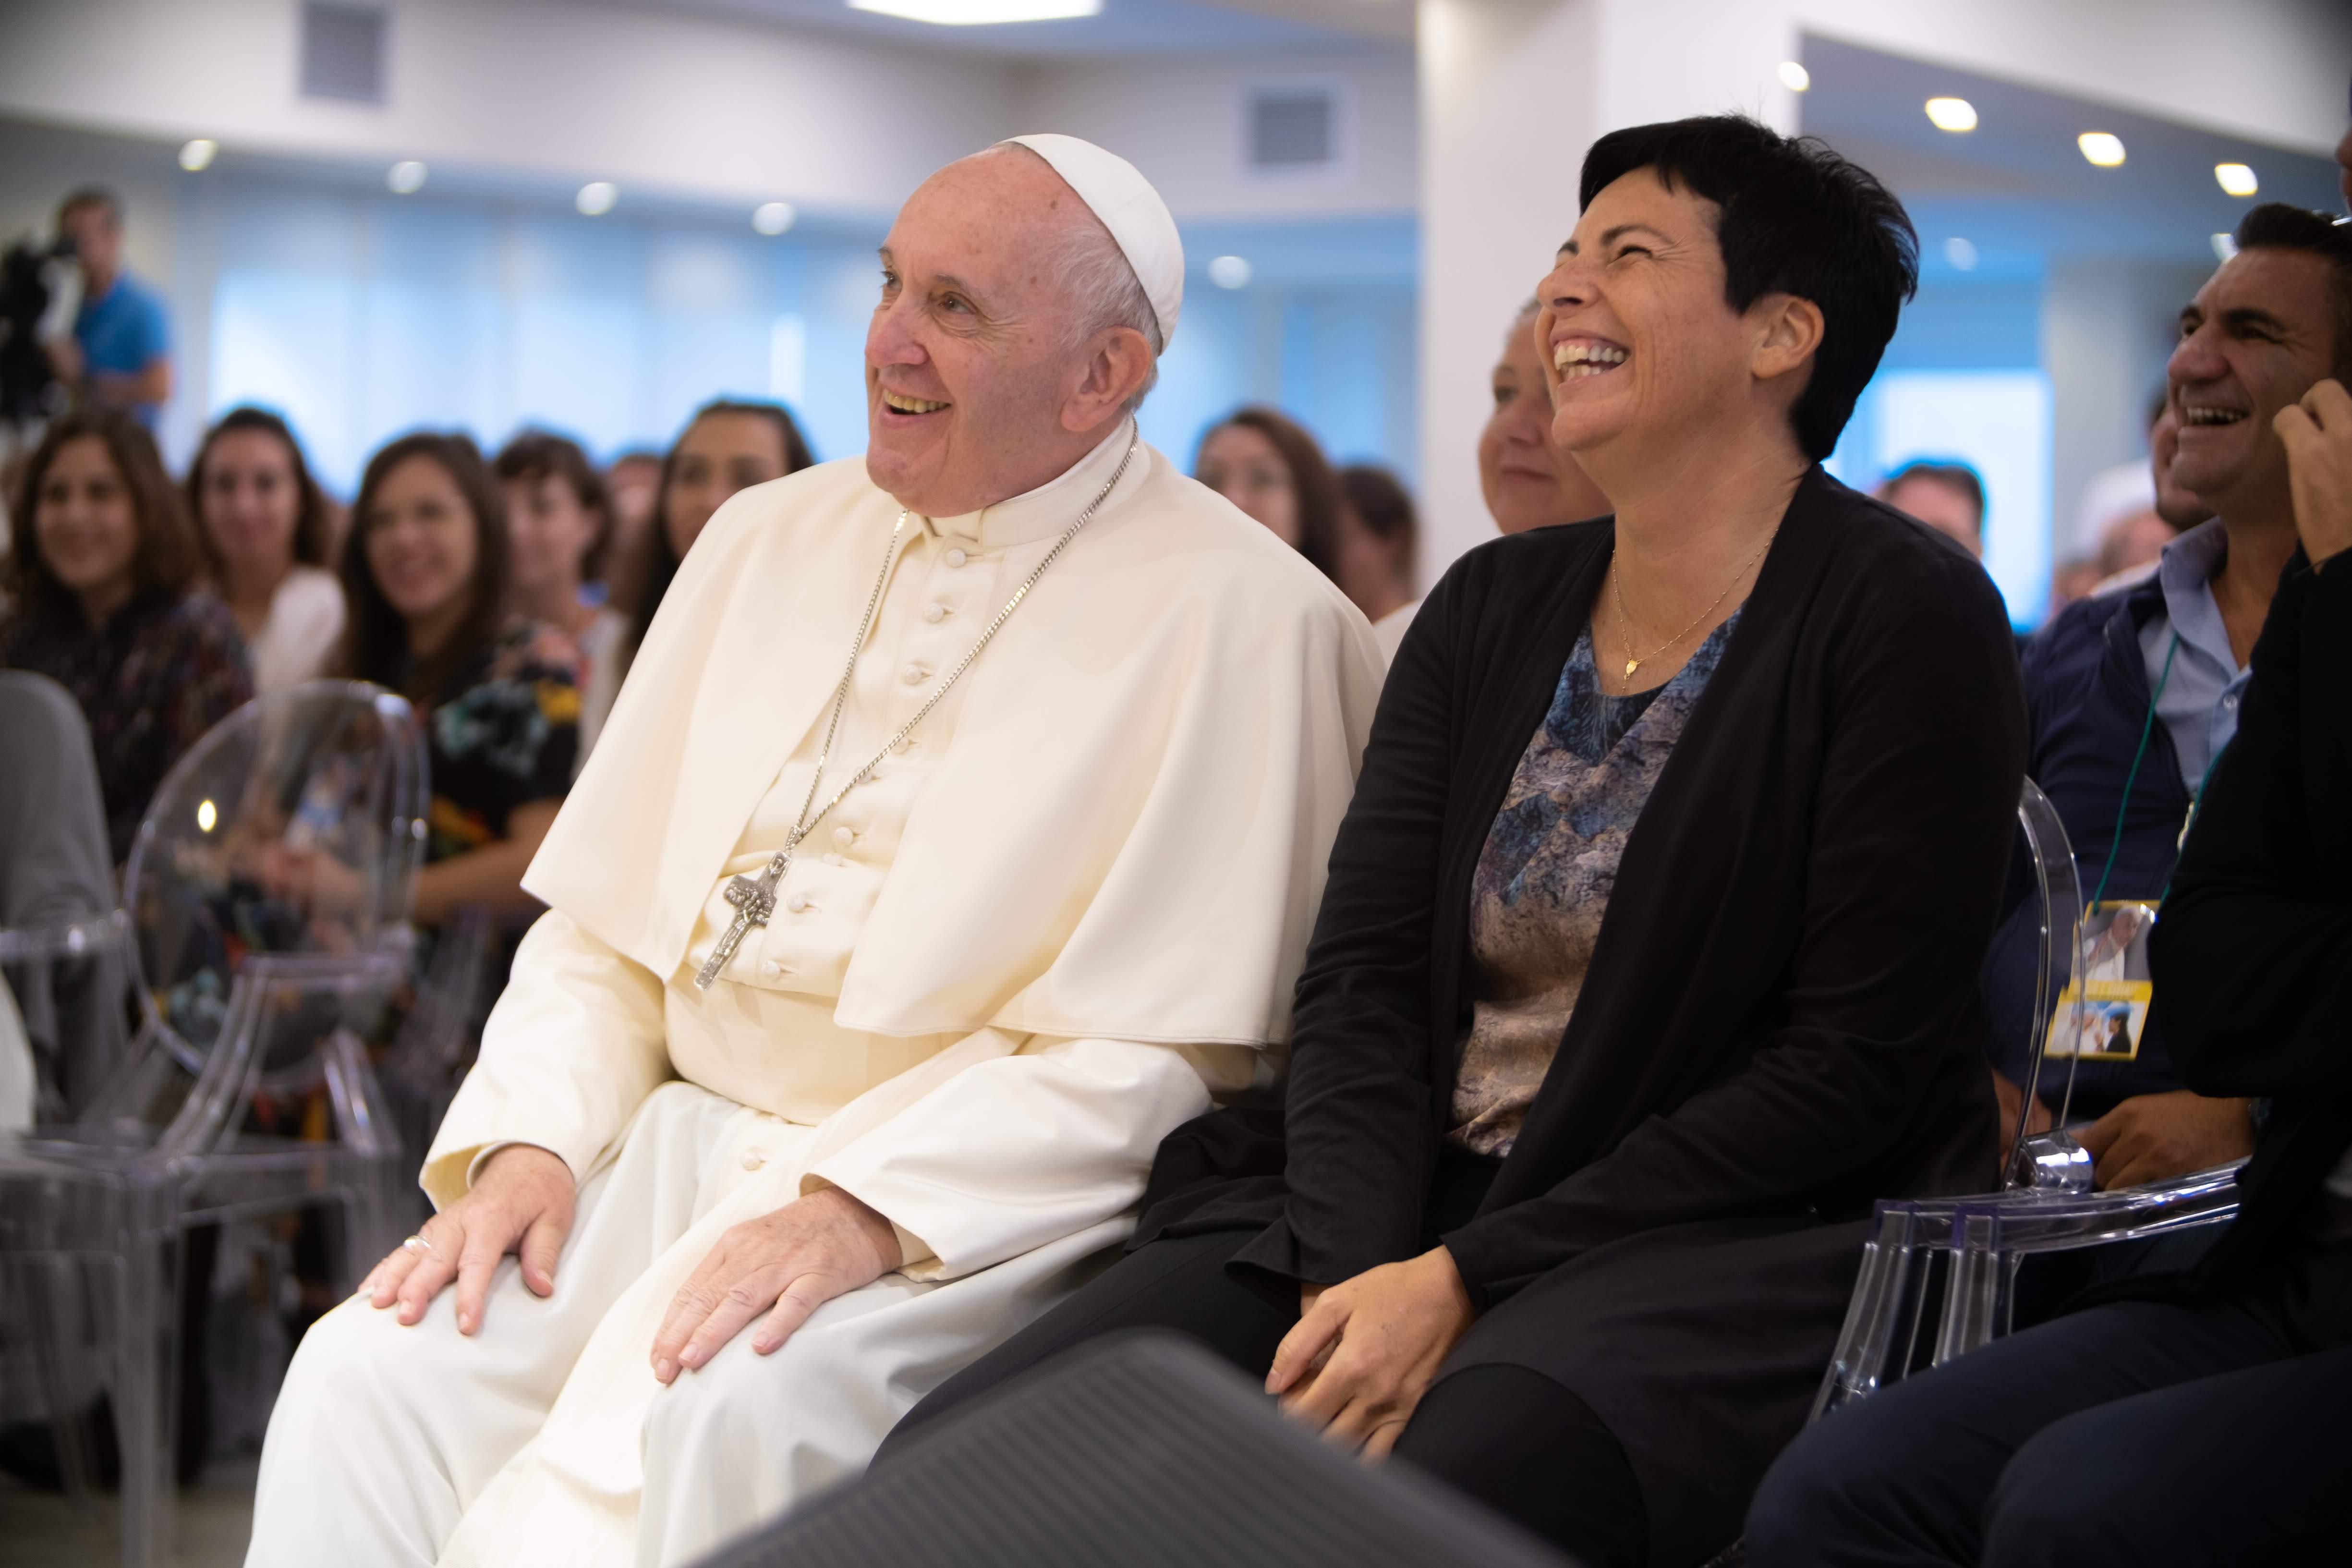 Papa Francesco e Chiara Amirante sorridono